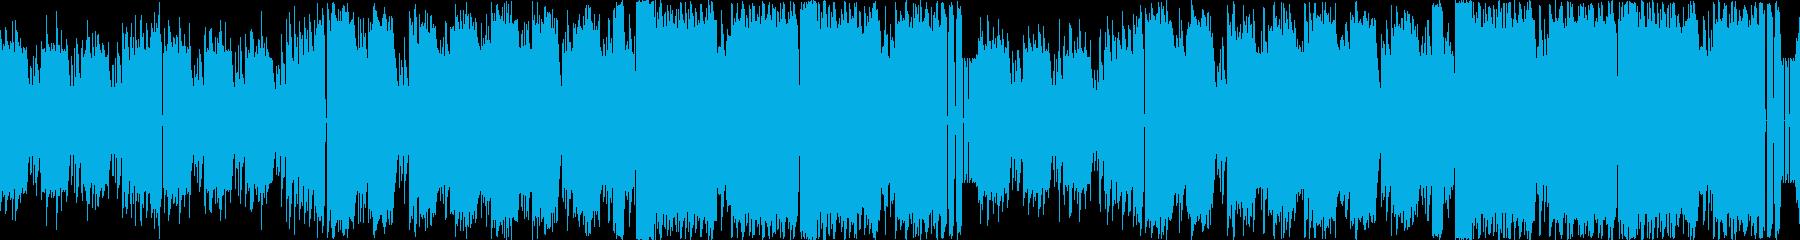 8bitチップチューン:アクション#01の再生済みの波形